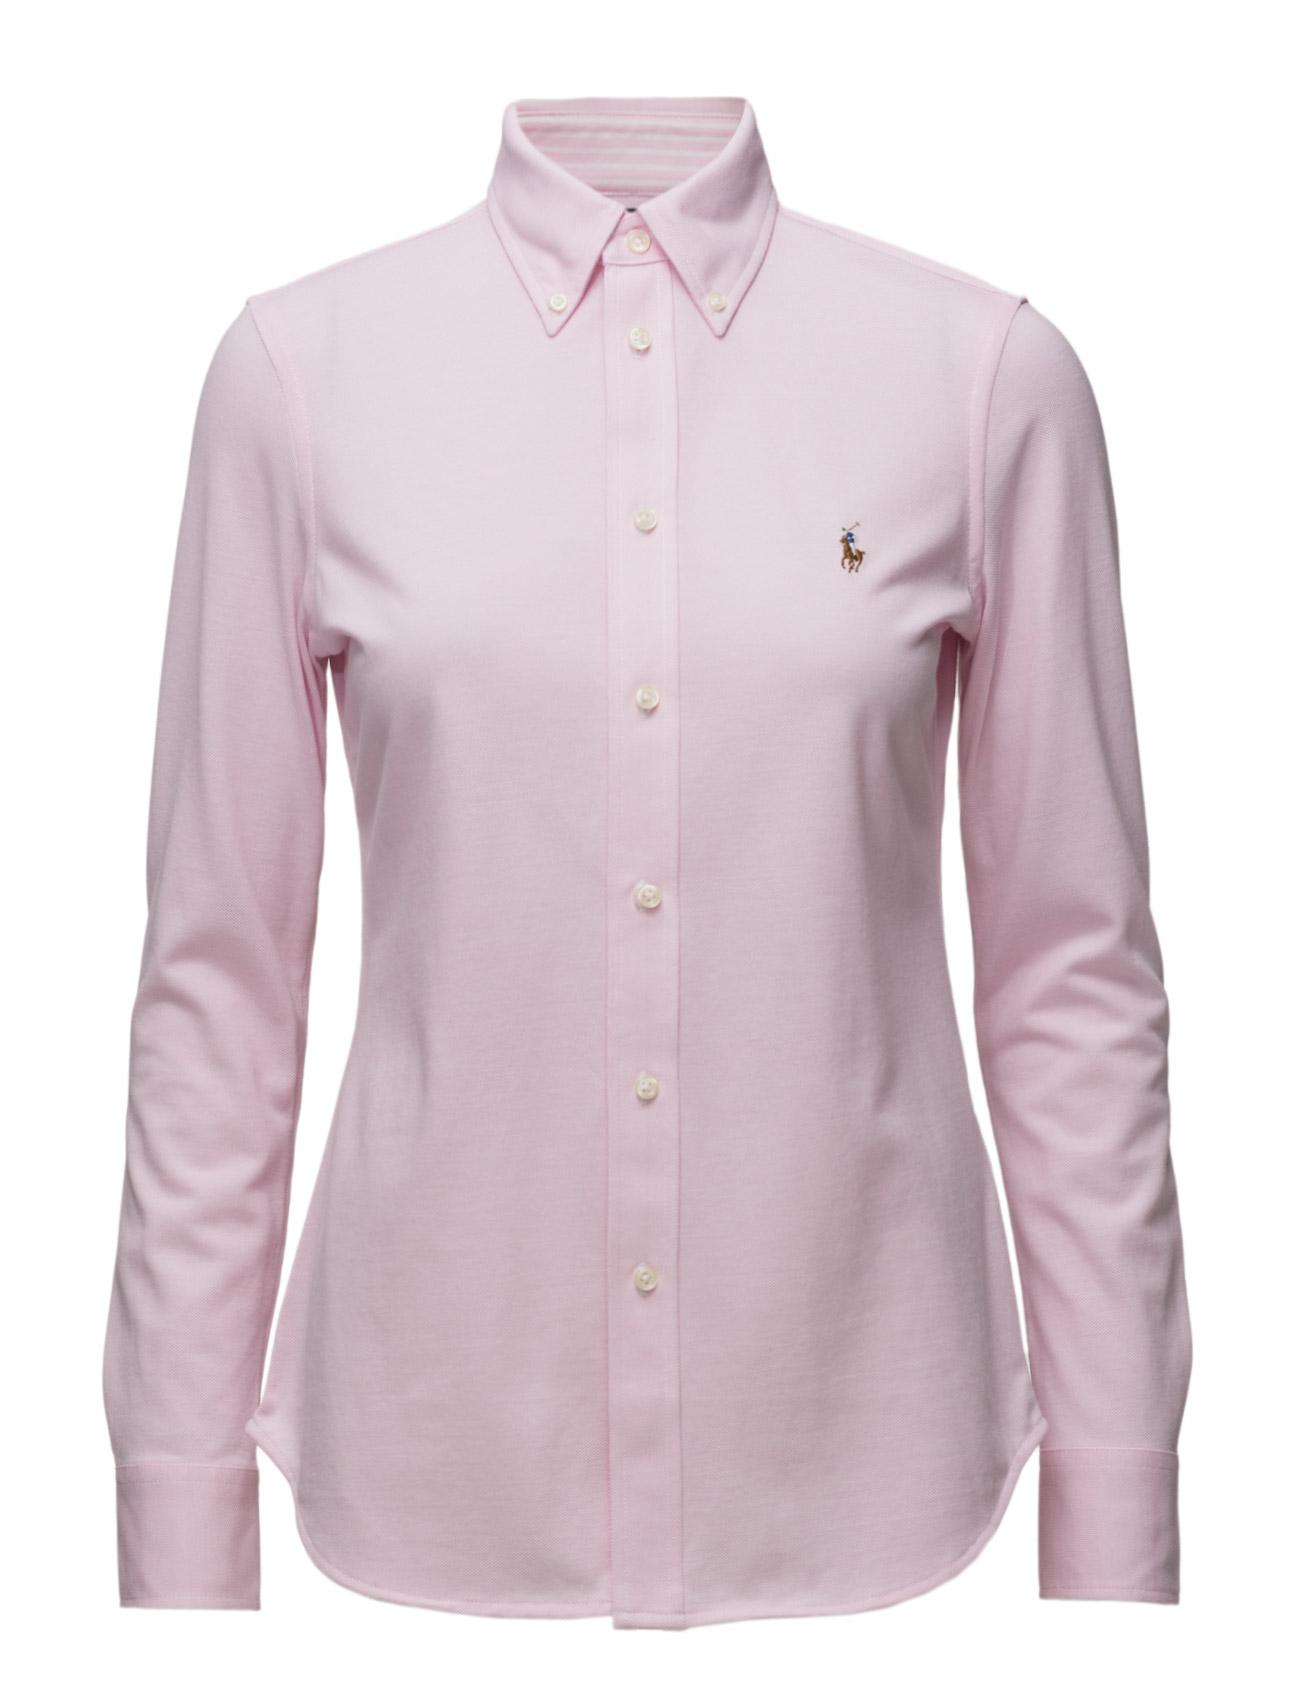 Polo Ralph Lauren Knit Cotton Oxford Shirt